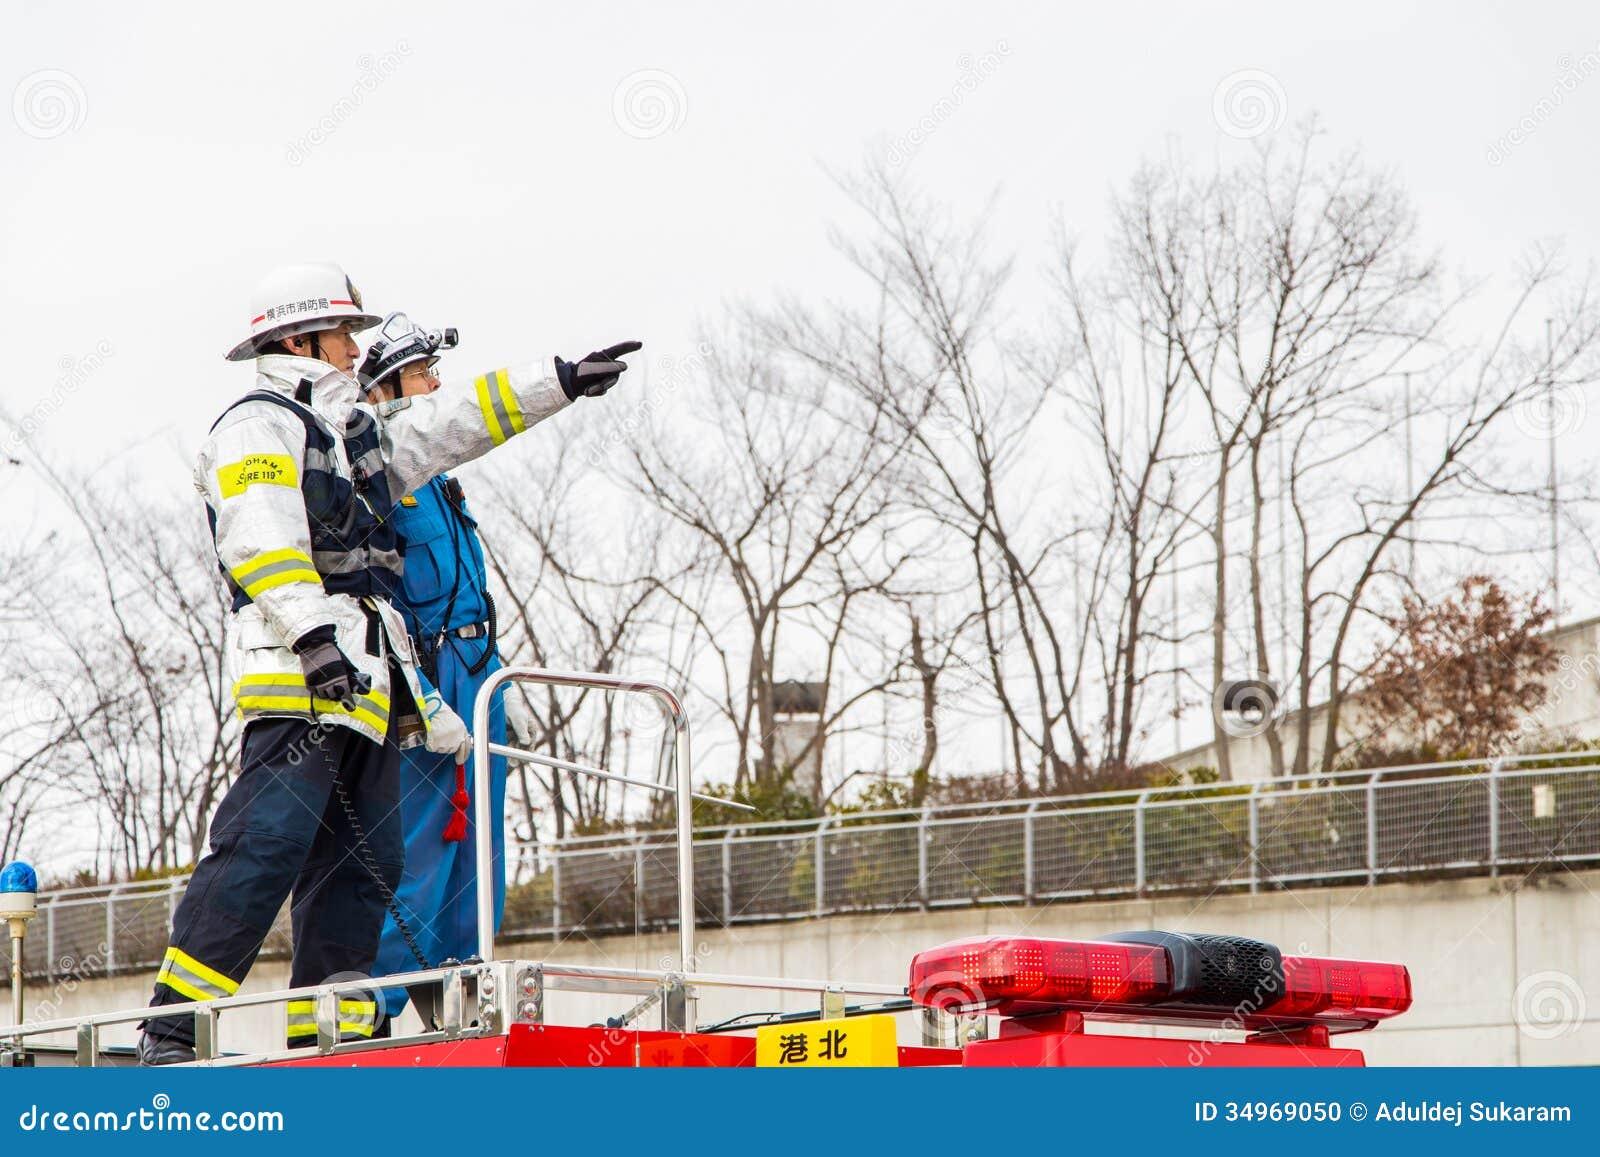 Year's Fire Review Kanagawa, Japan Editorial Image - Image ...